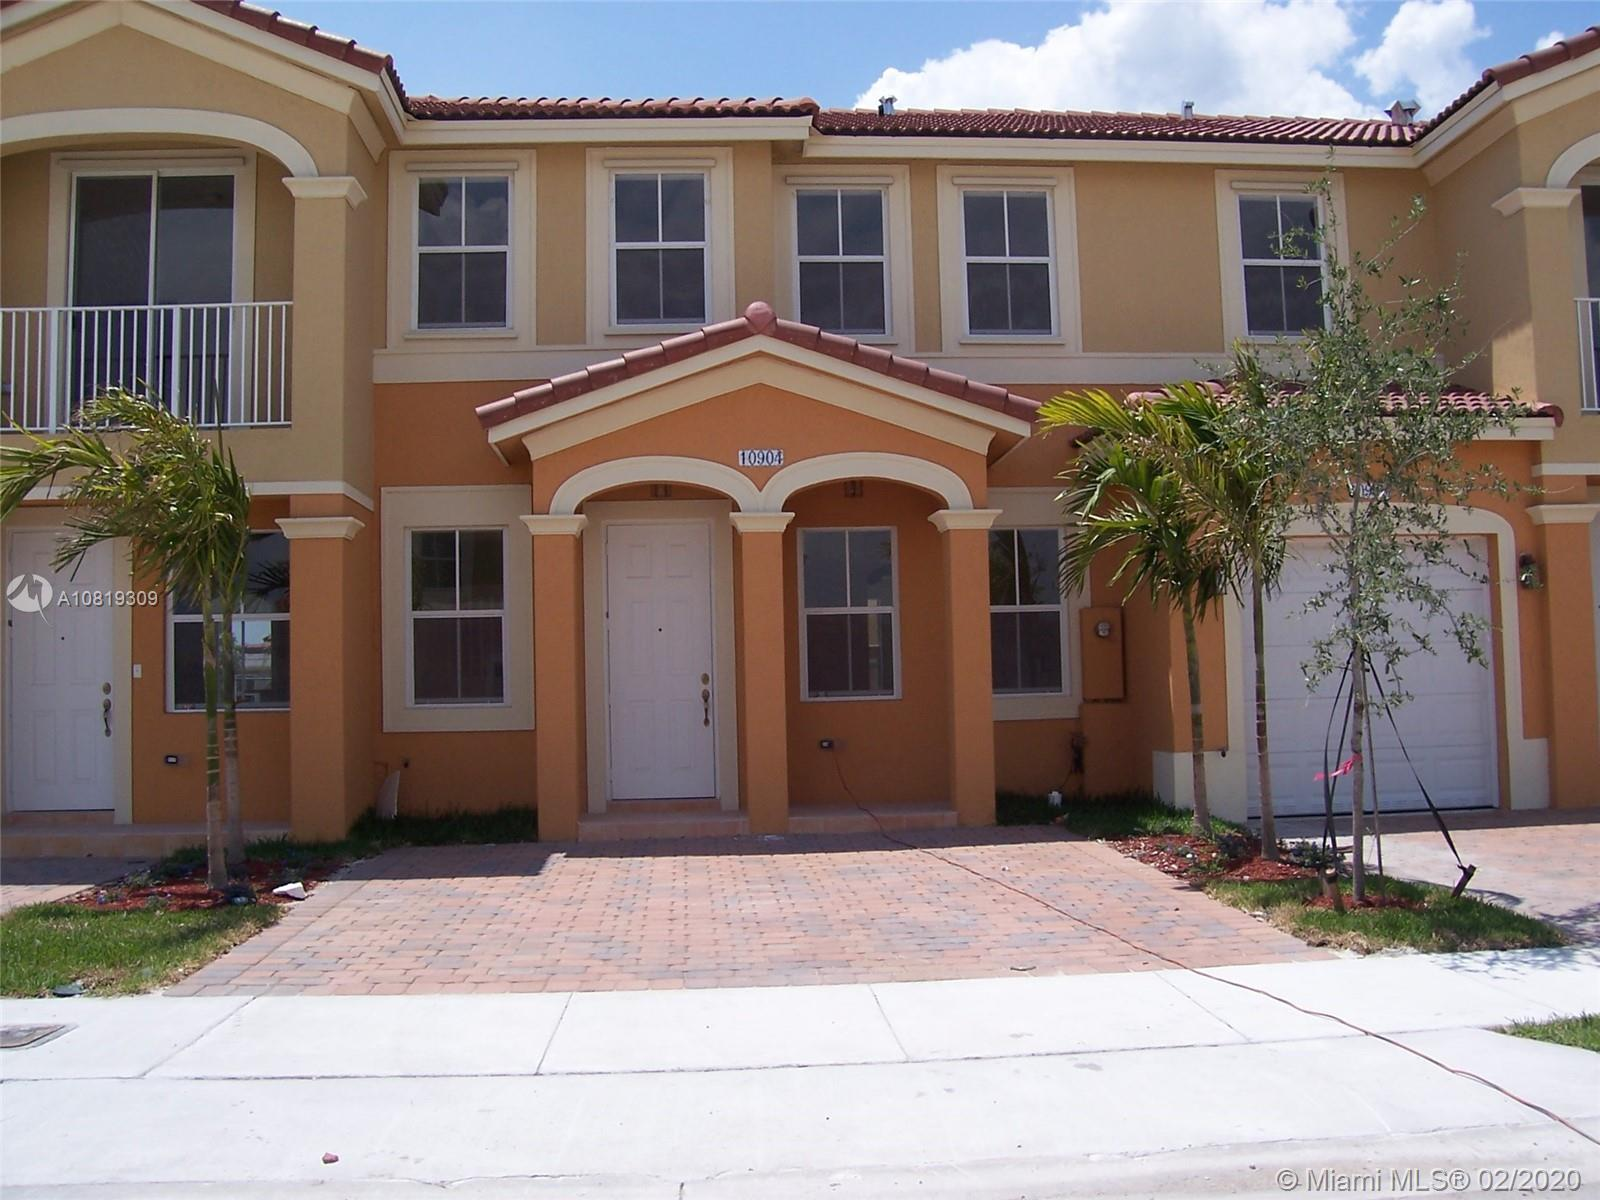 10904 SW 204 Lane #10904, Homestead, FL 33032 - Homestead, FL real estate listing